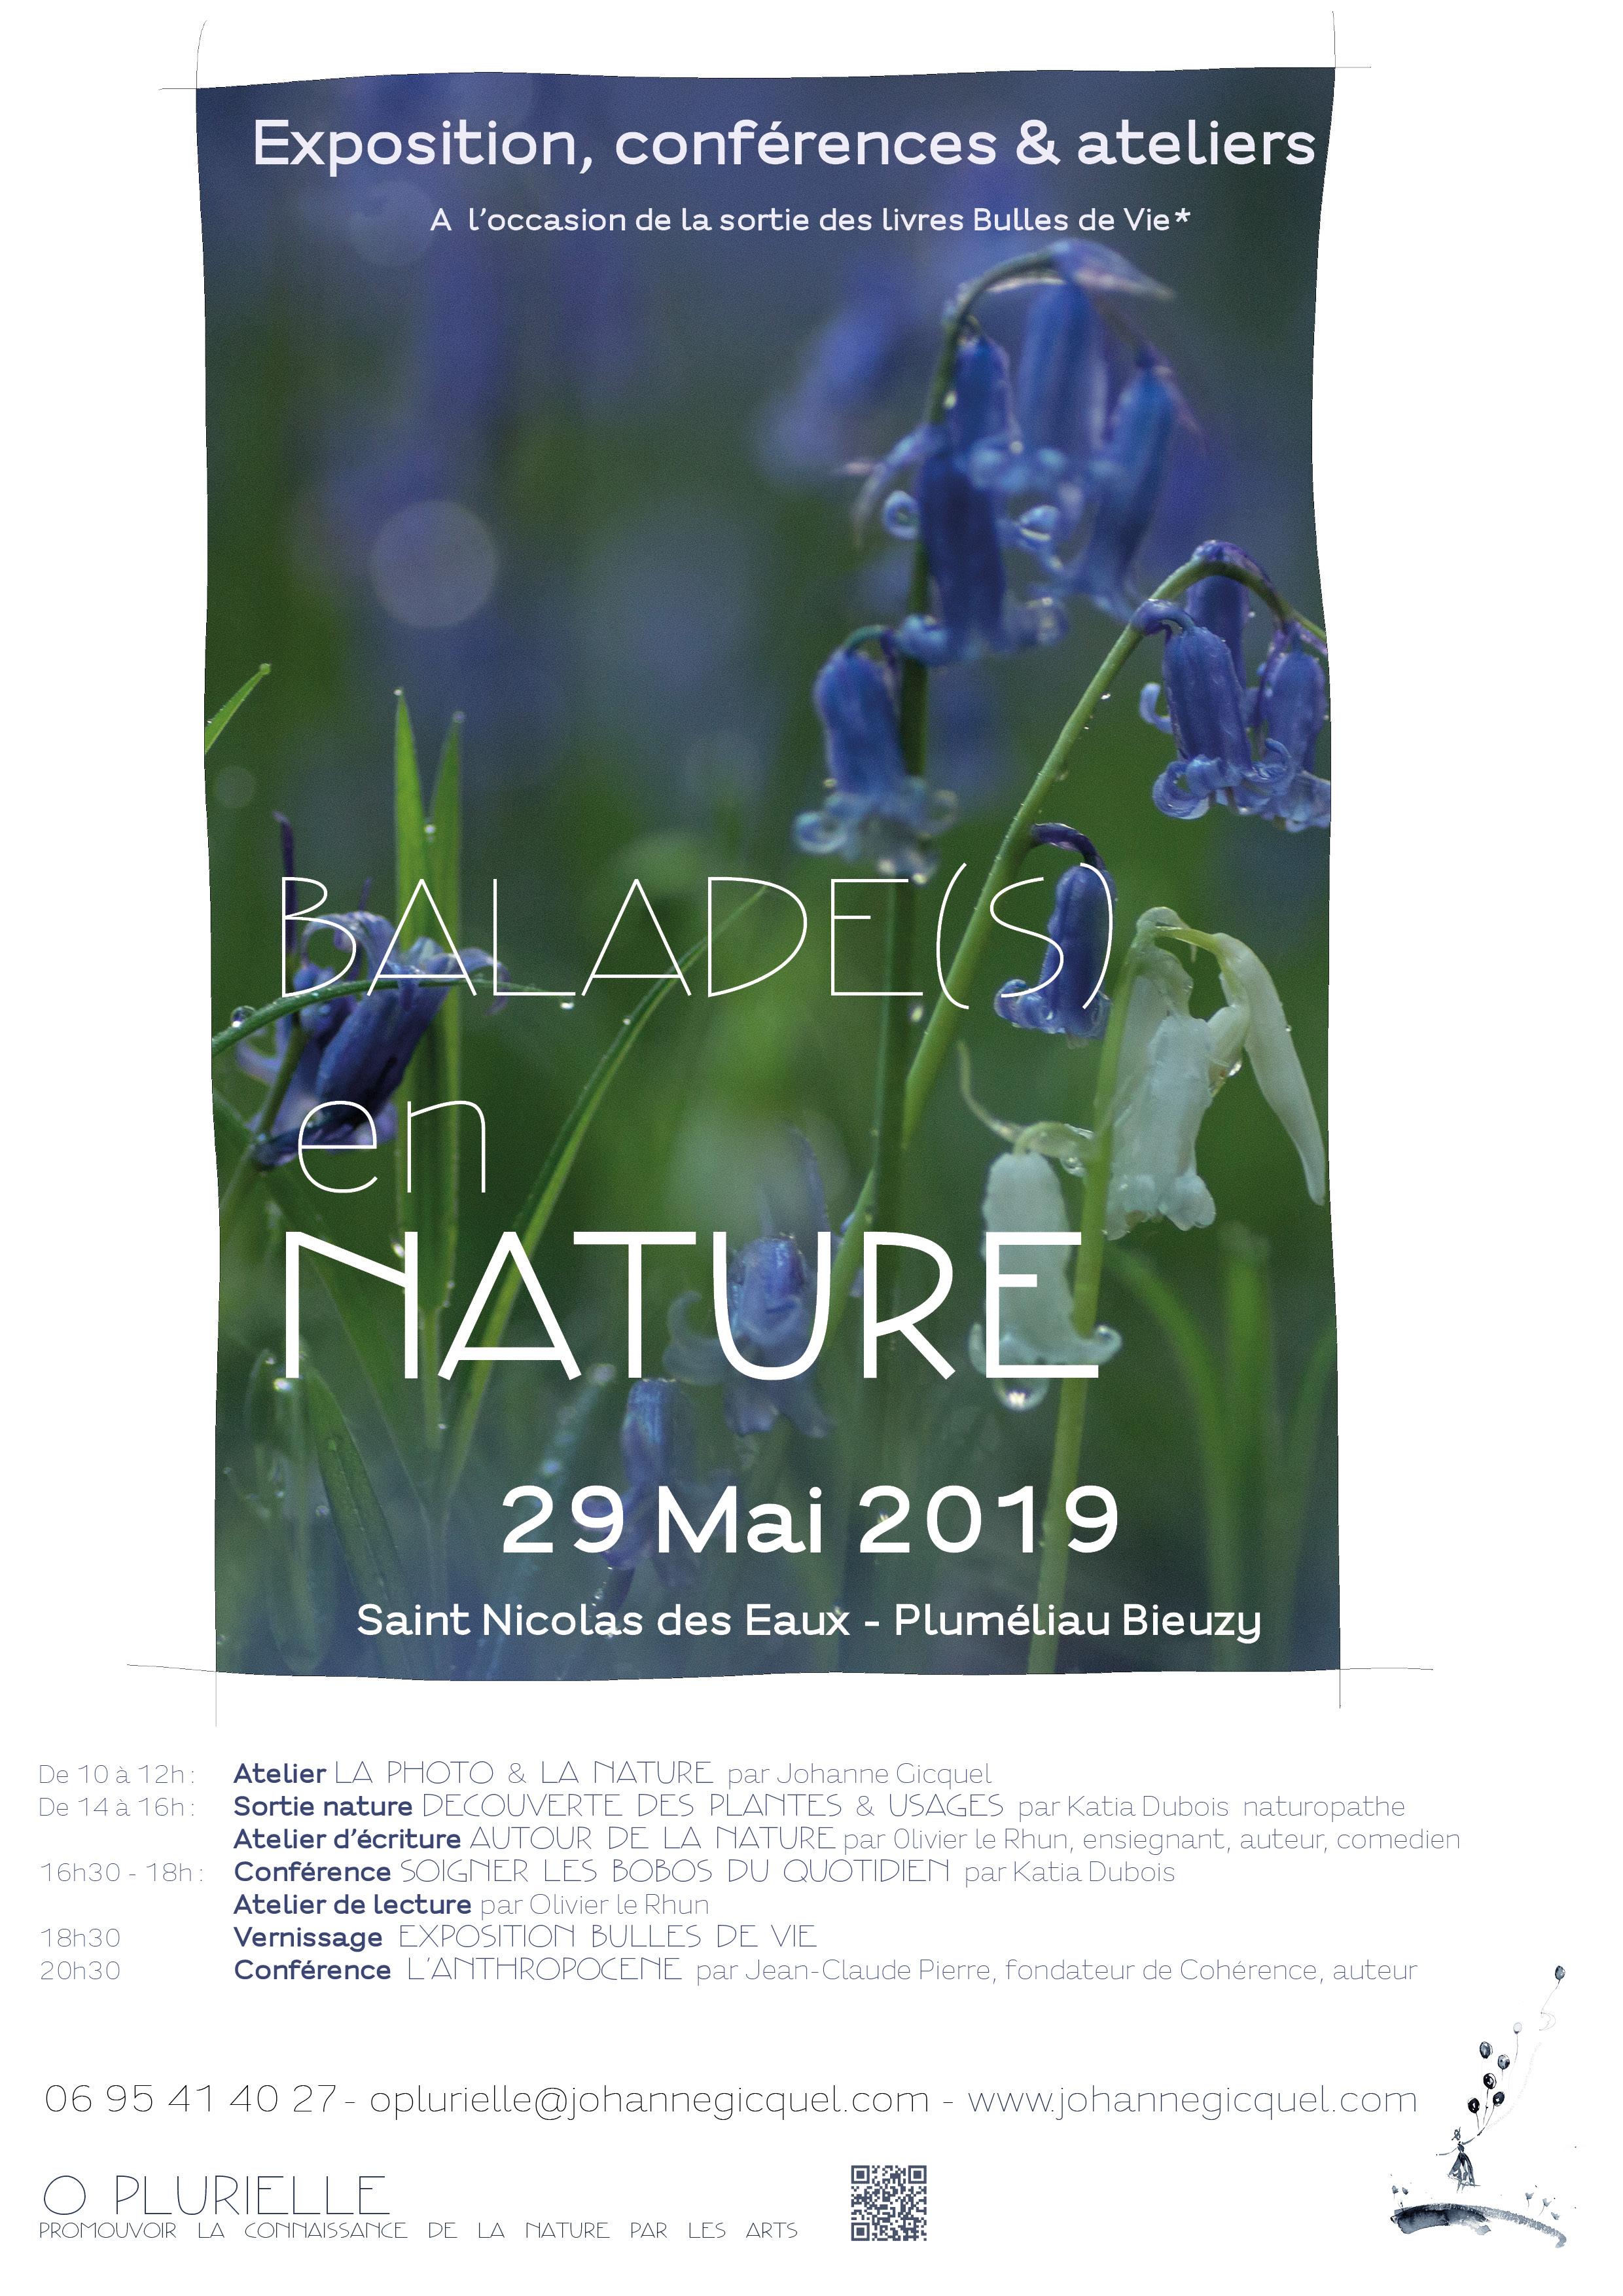 Balade(s) en Nature